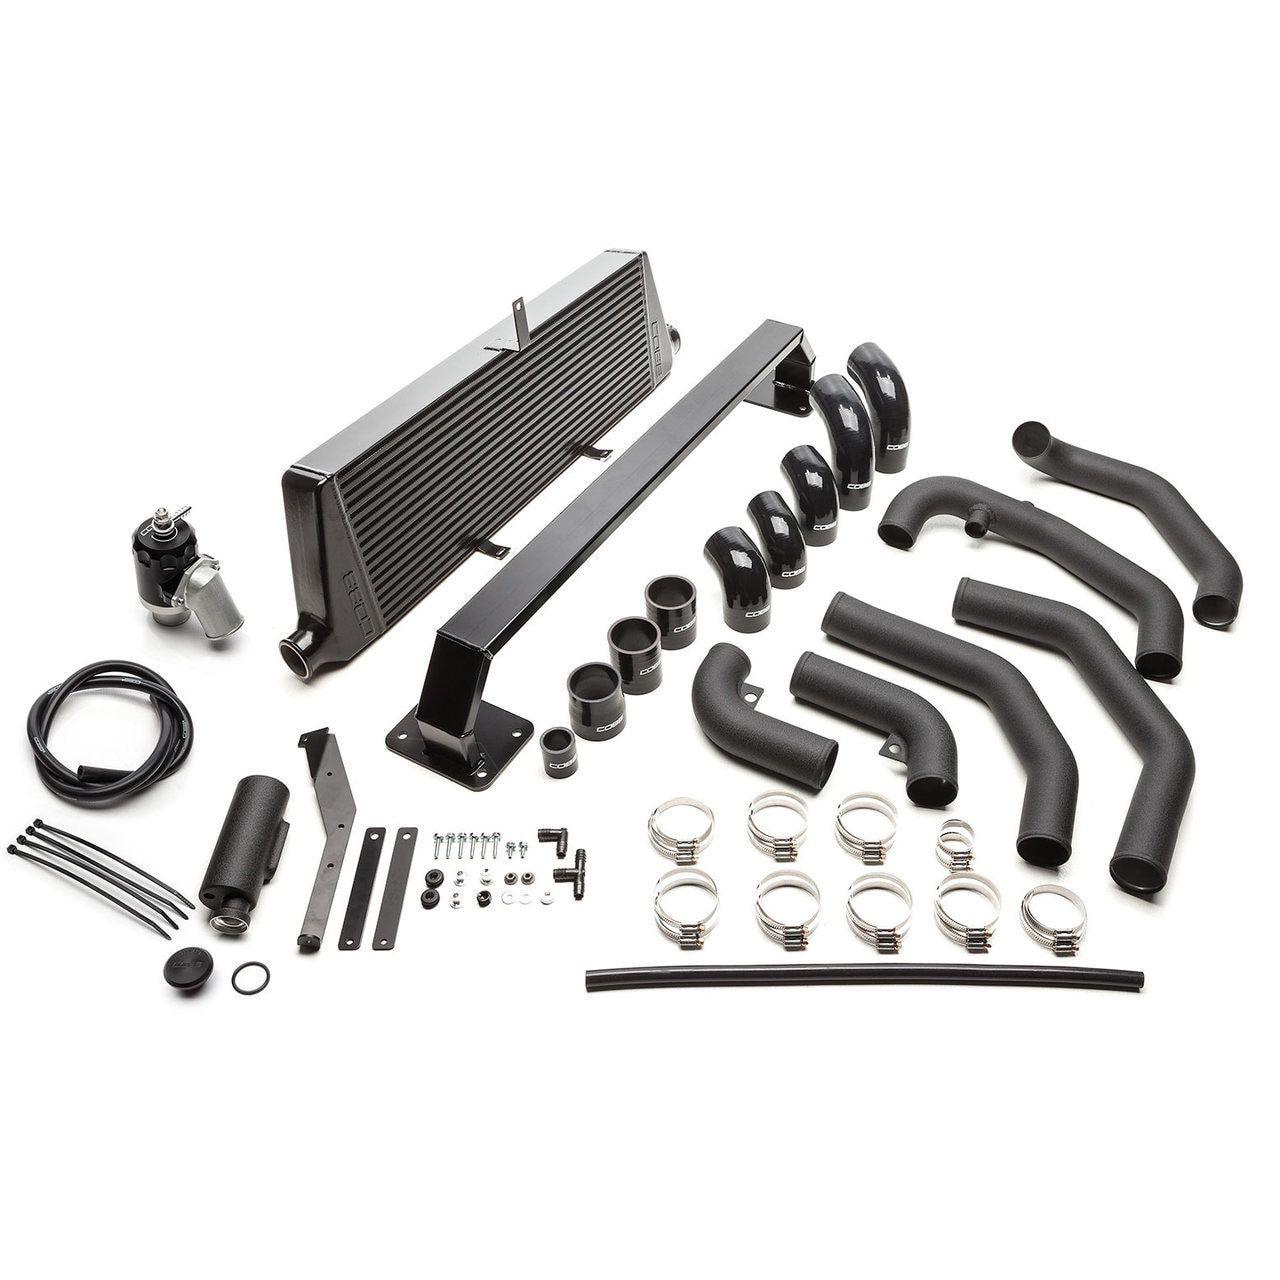 Cobb Front Mount Intercooler Kit (Black) For 1114 Subaru